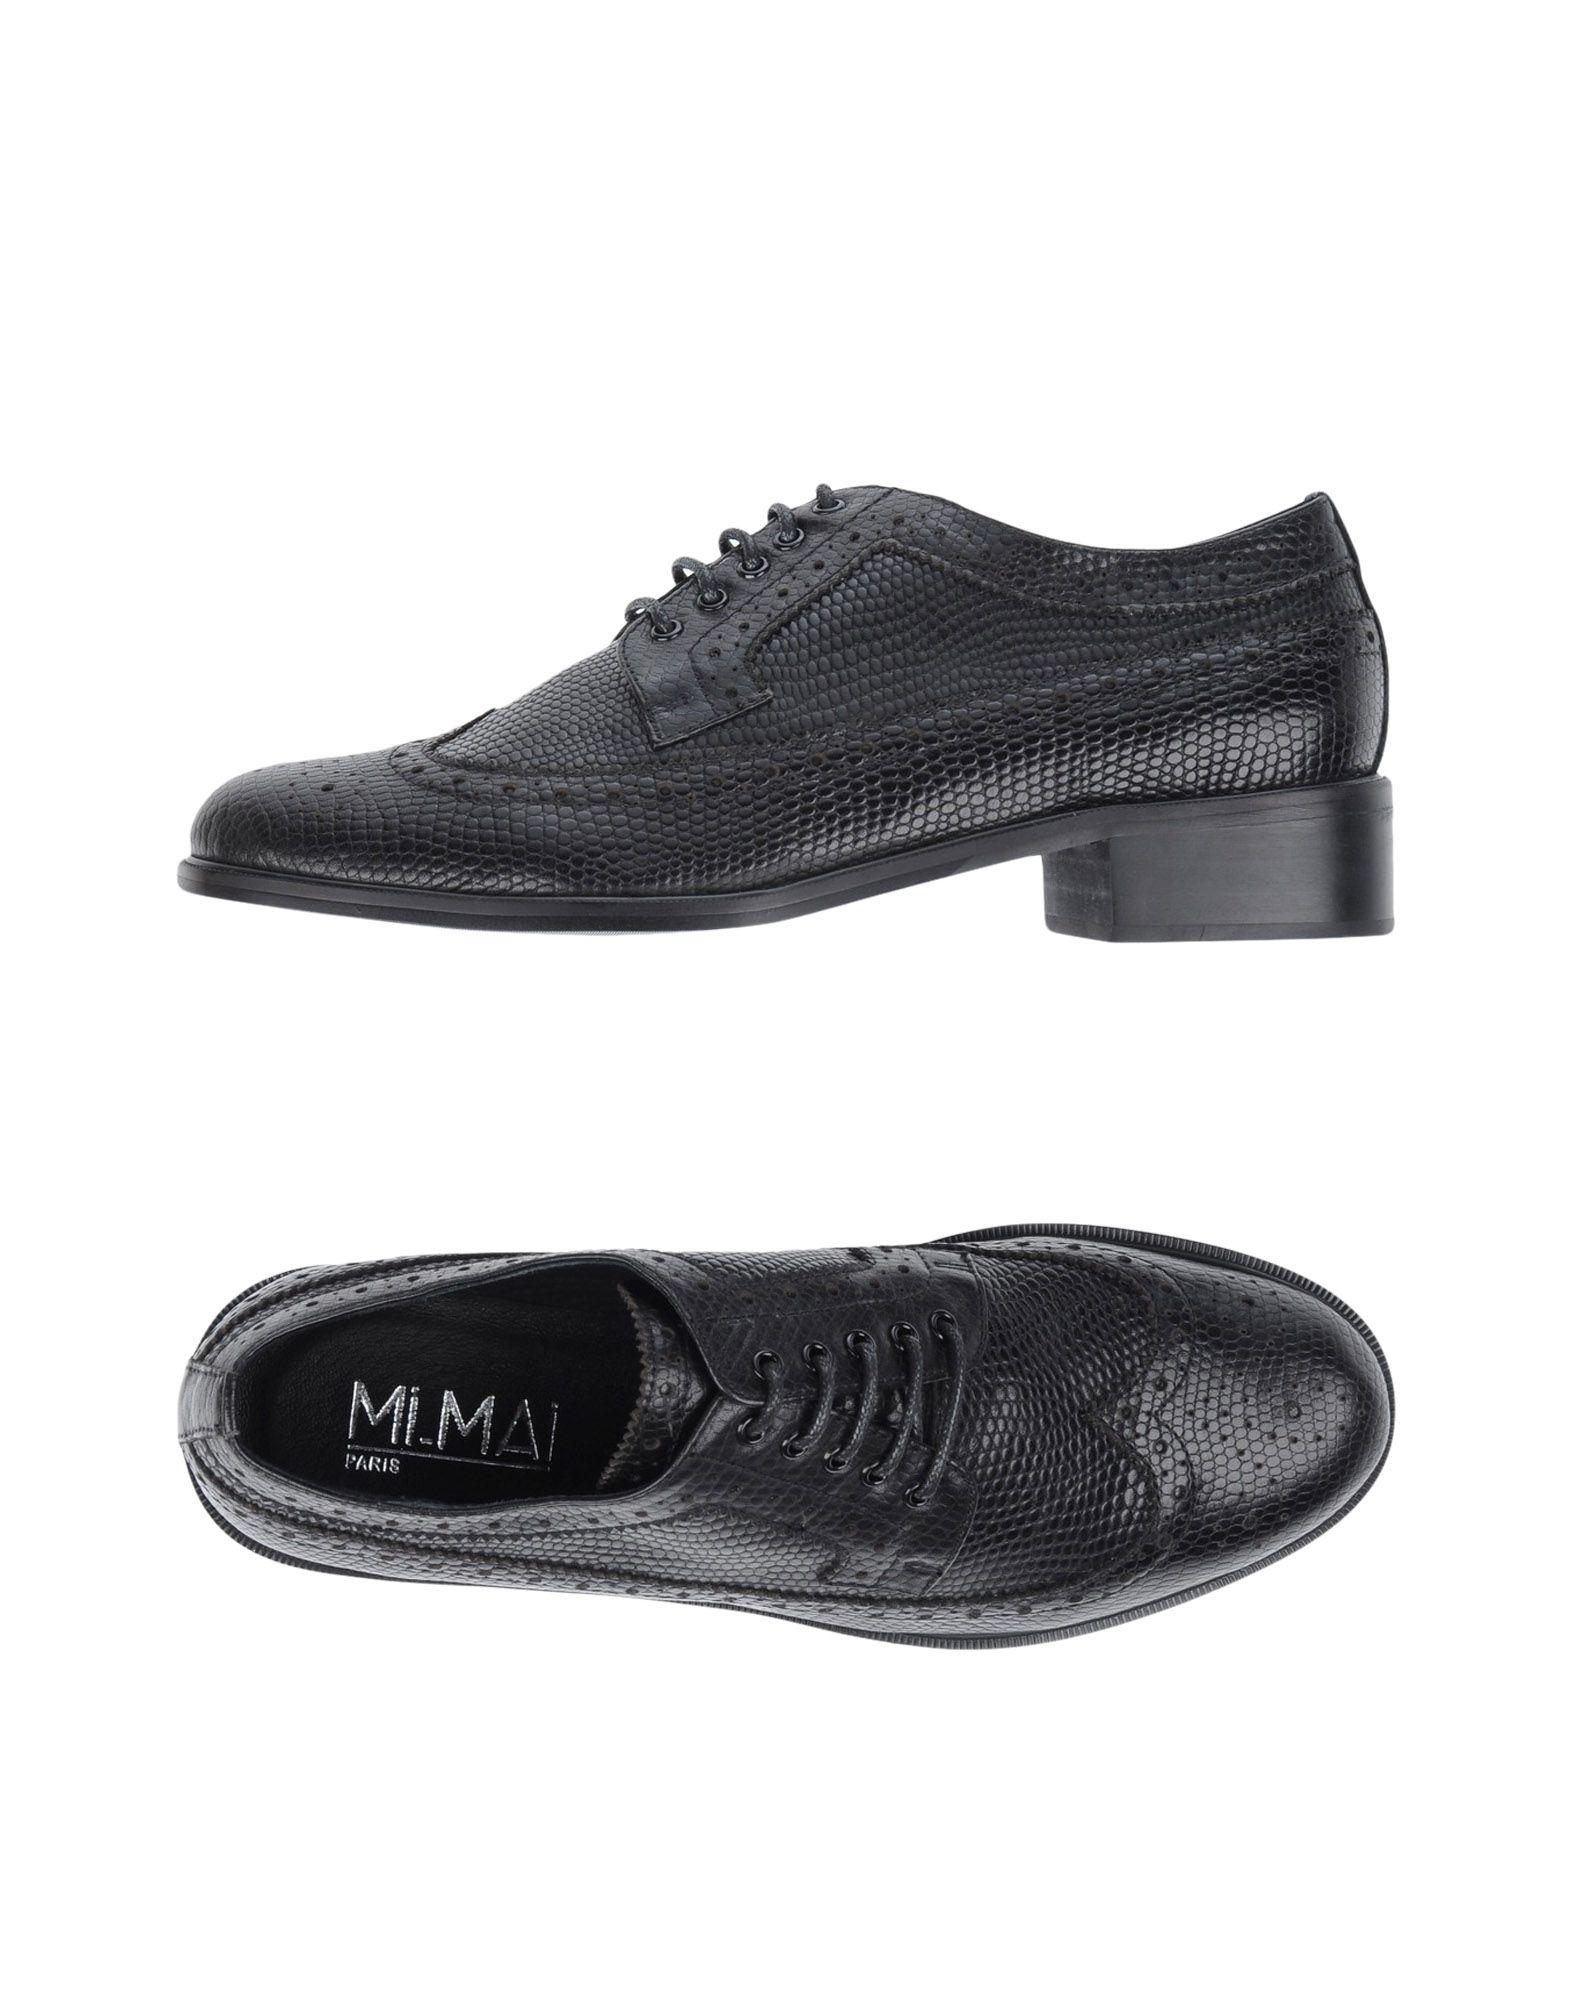 Mi/Mai Schnürschuhe Damen  11278167IF Gute Qualität beliebte Schuhe